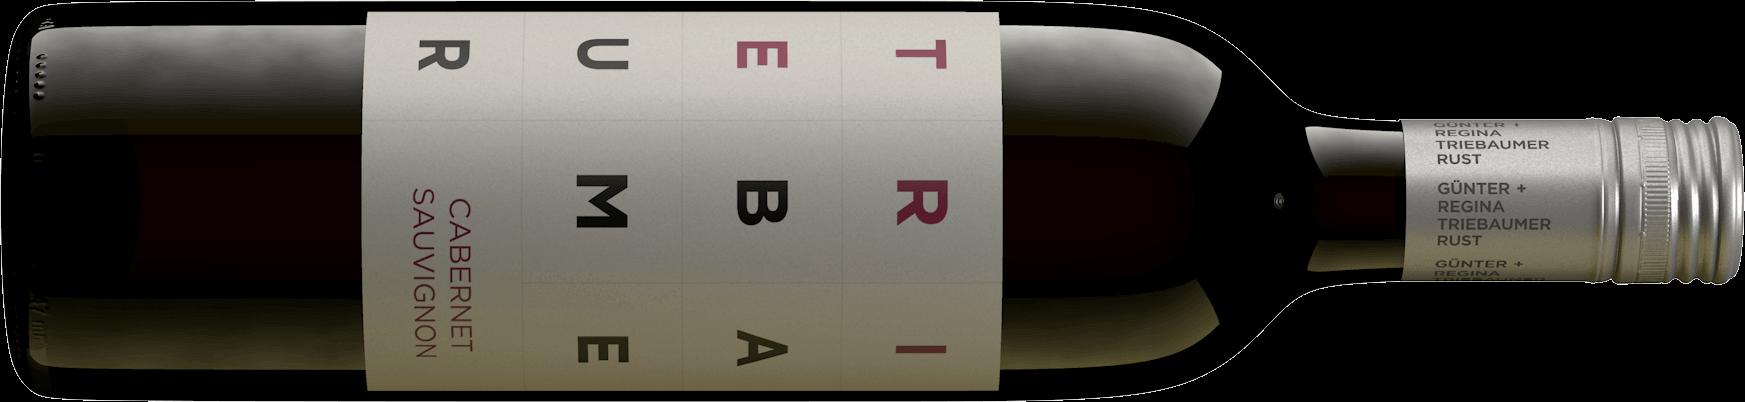 Cabernet Sauvignon 2016